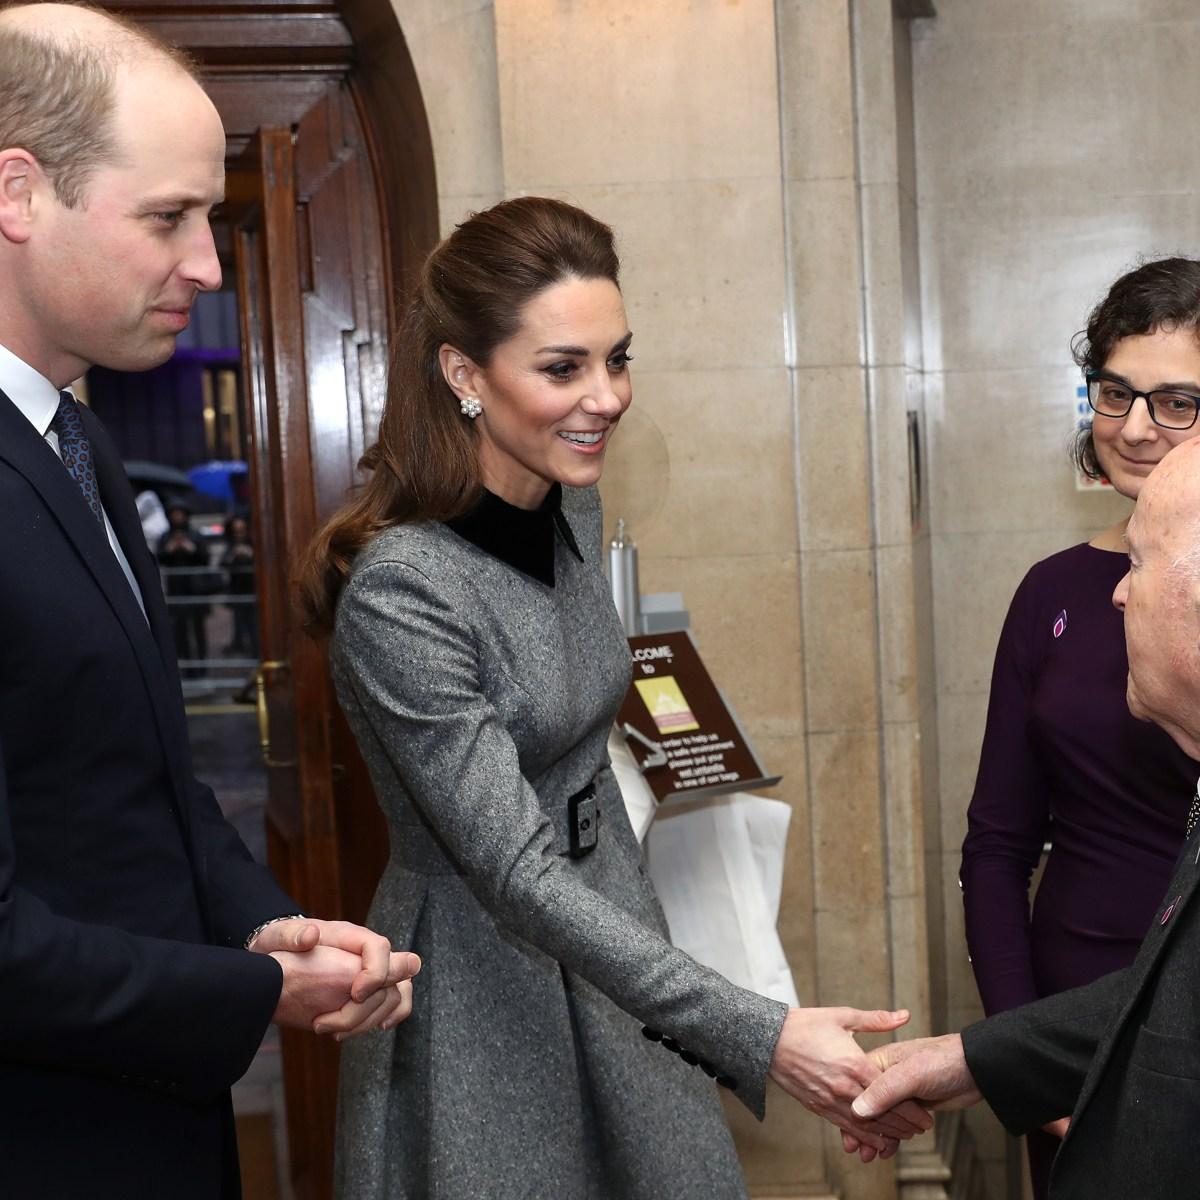 Kate Middleton Unveils Powerful Portraits of Holocaust Survivors She Photographed at Kensington Palace